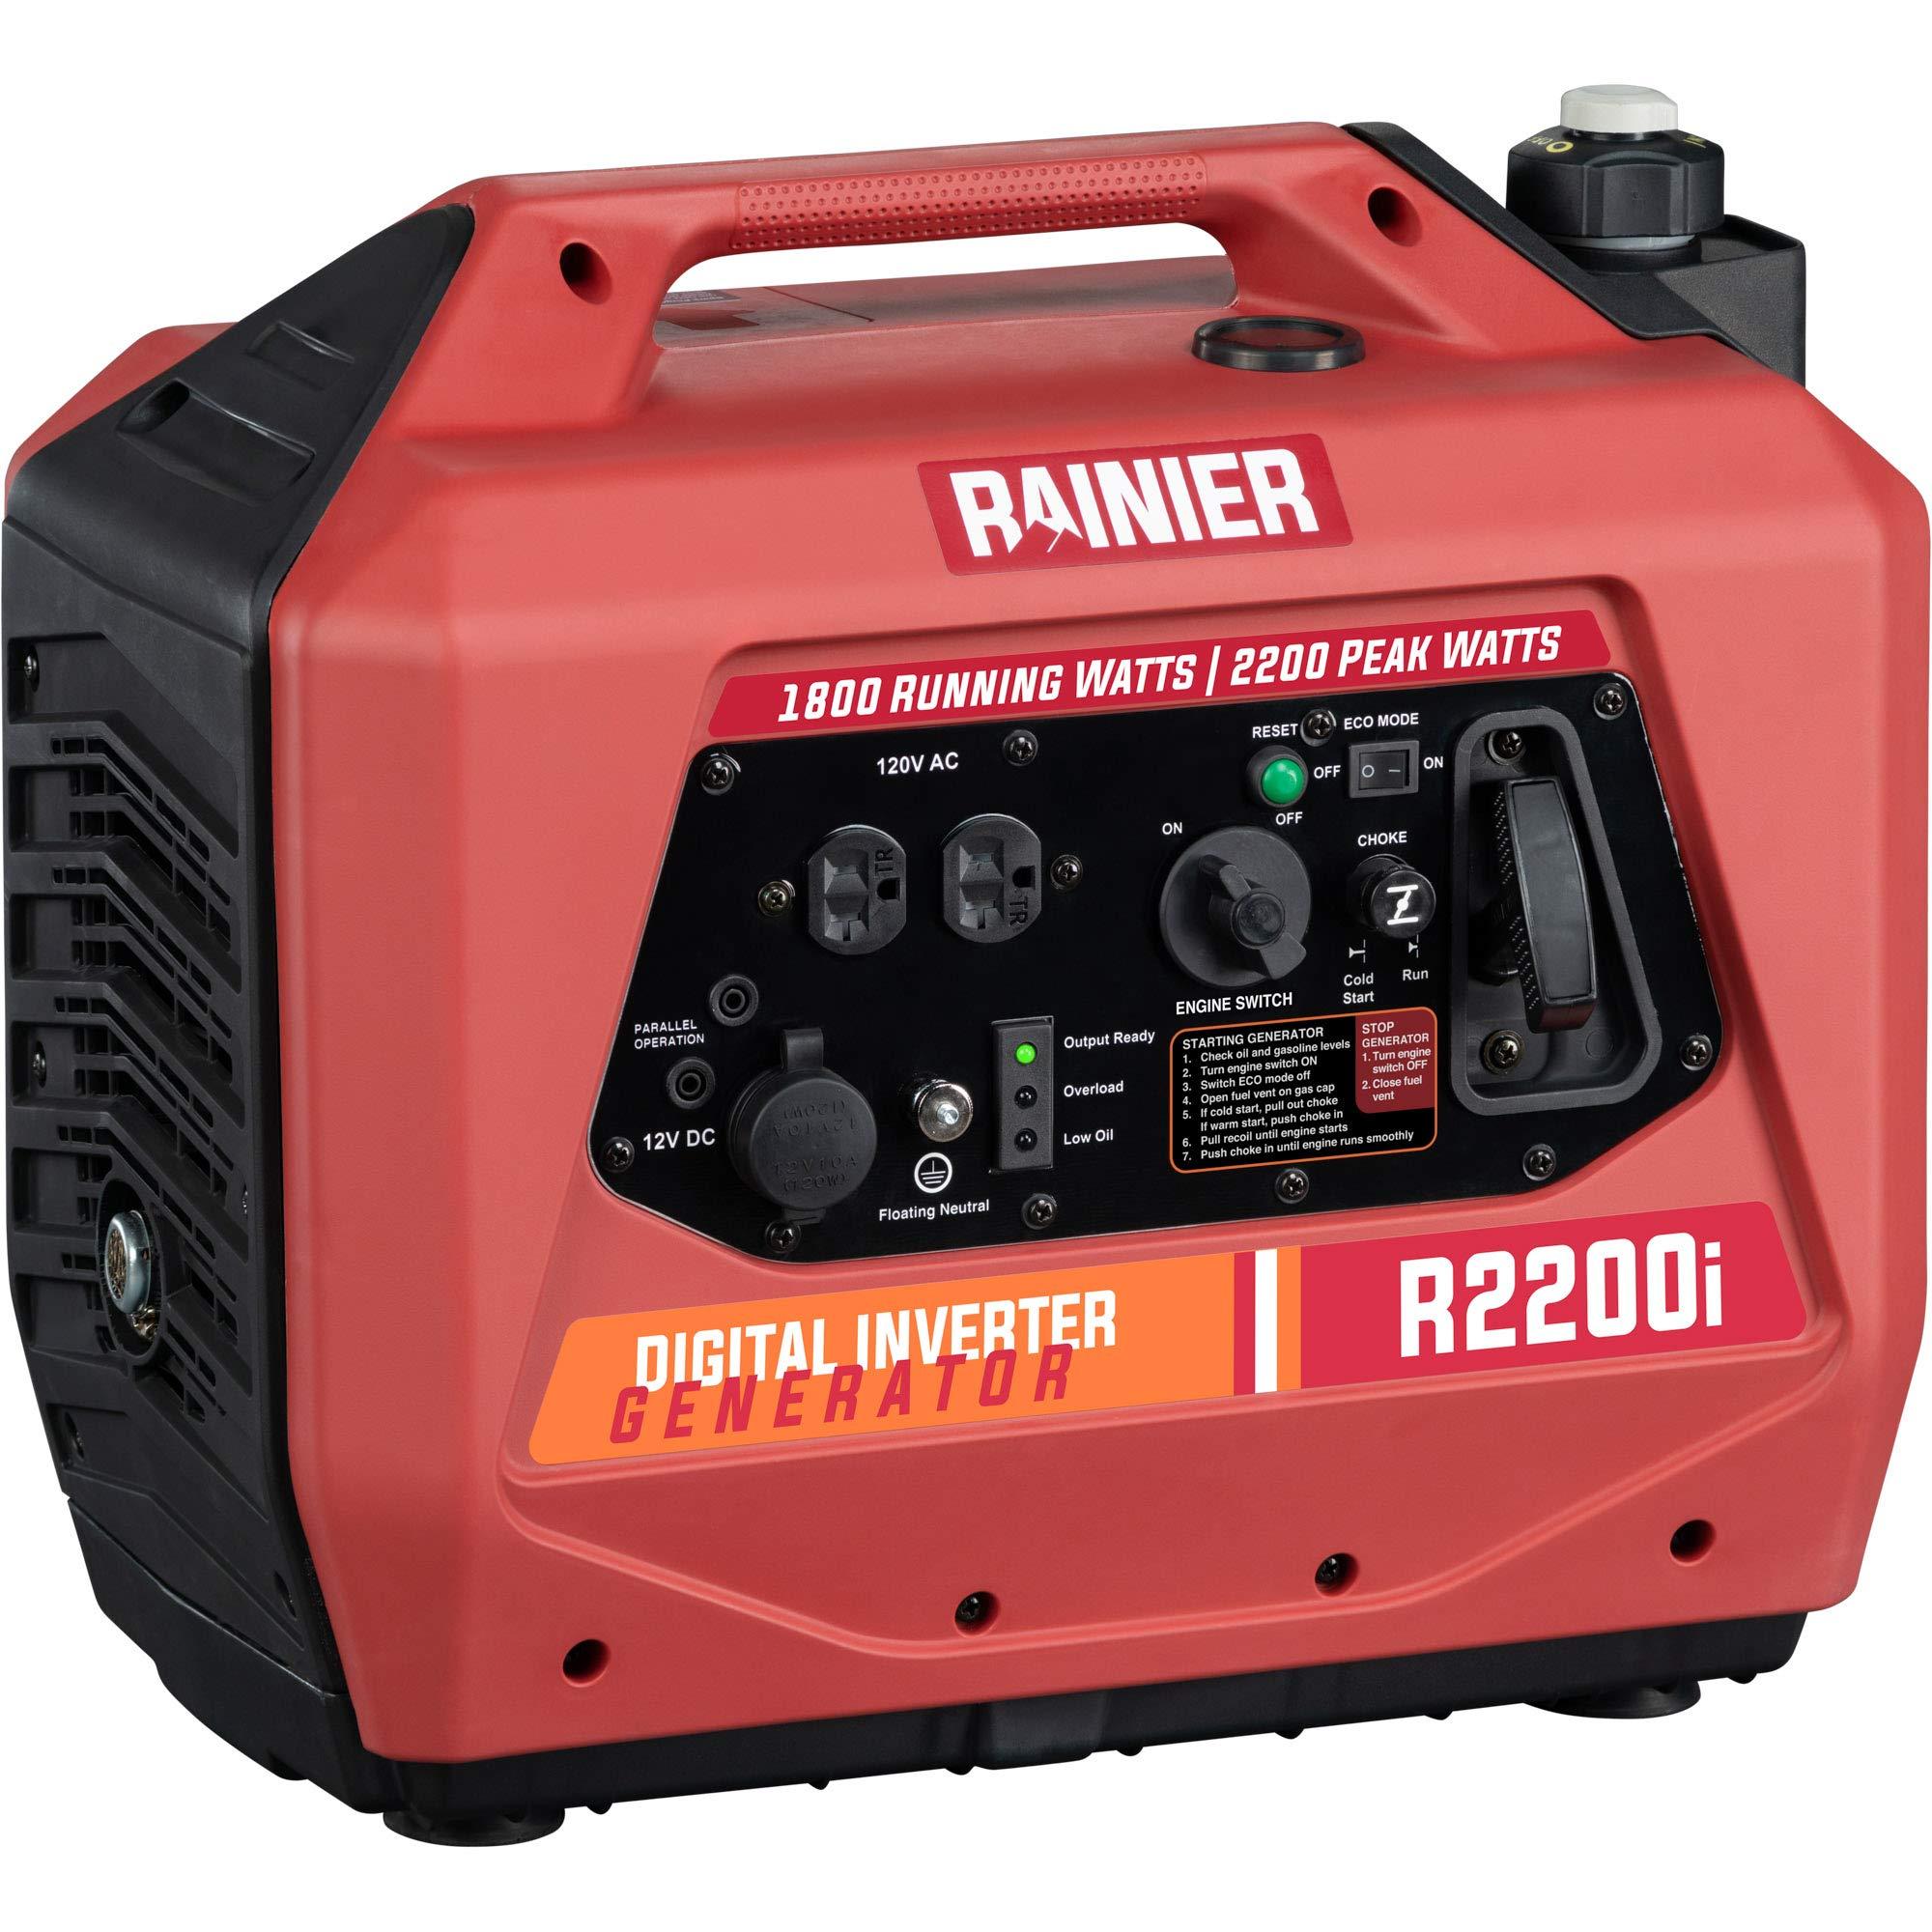 Rainier R2200i Super Quiet Portable Inverter Generator - 1800 Running & 2200 Peak - Gas Powered - CARB Compliant by Rainier Outdoor Power Equipment